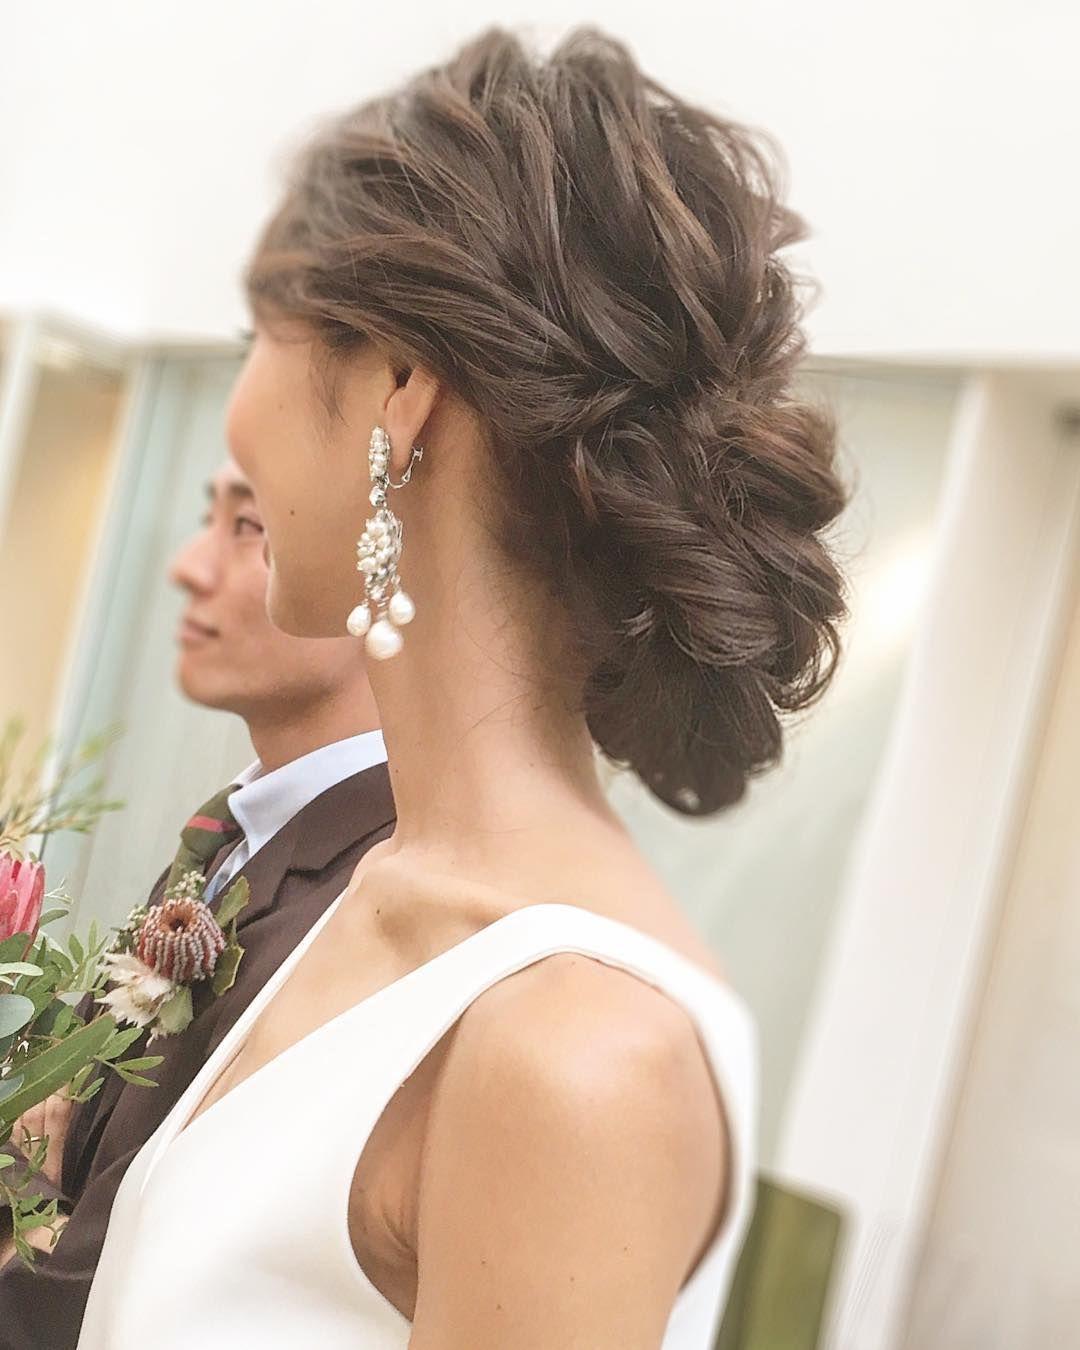 WEDDINGHAIR ウェディングヘア 低めシニヨン wedding hairstyles ウェディング ヘアスタイル bridalhair